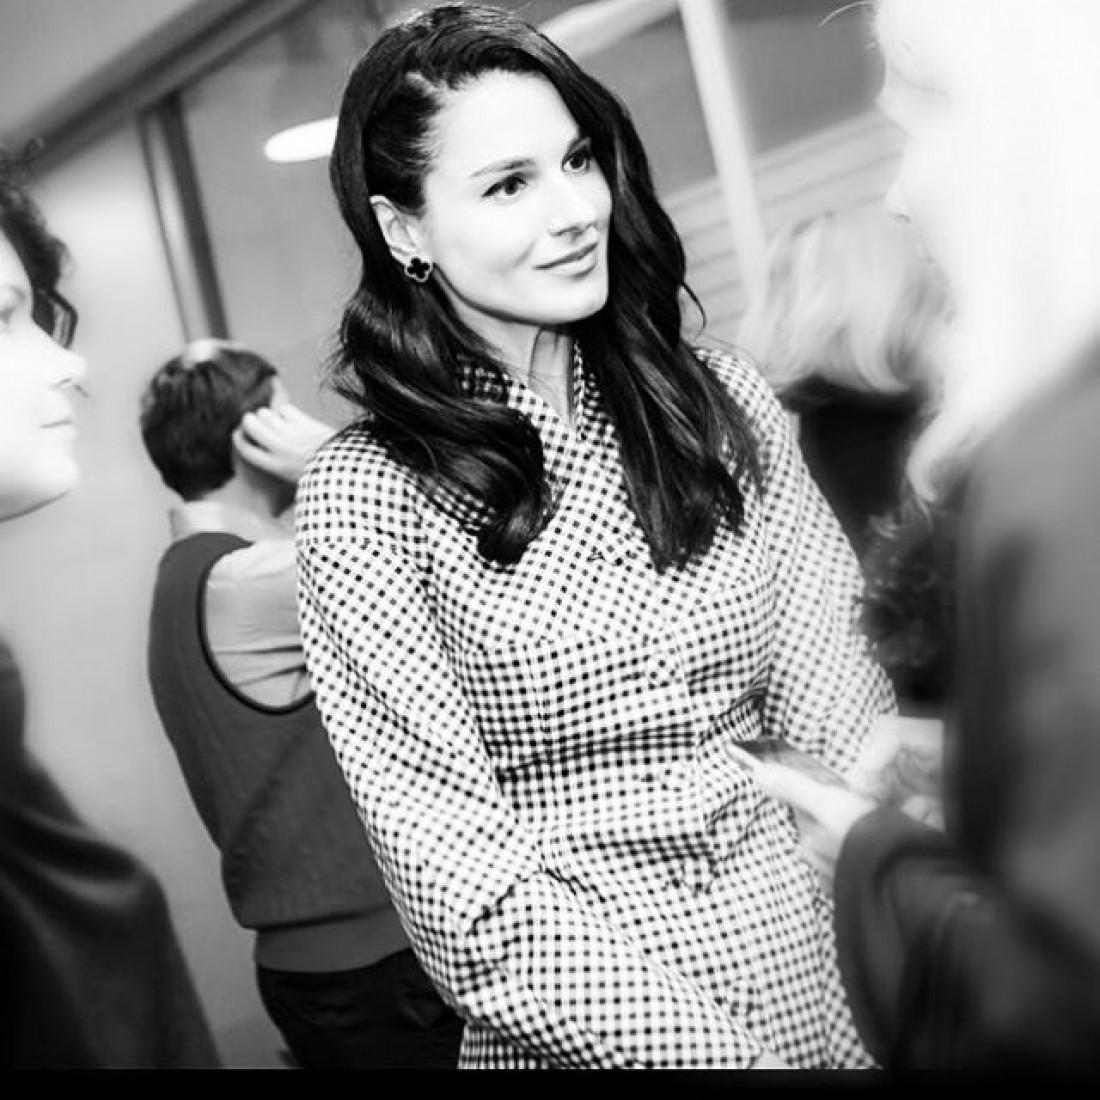 Маша станет ведущей шоу на телеканале СТБ